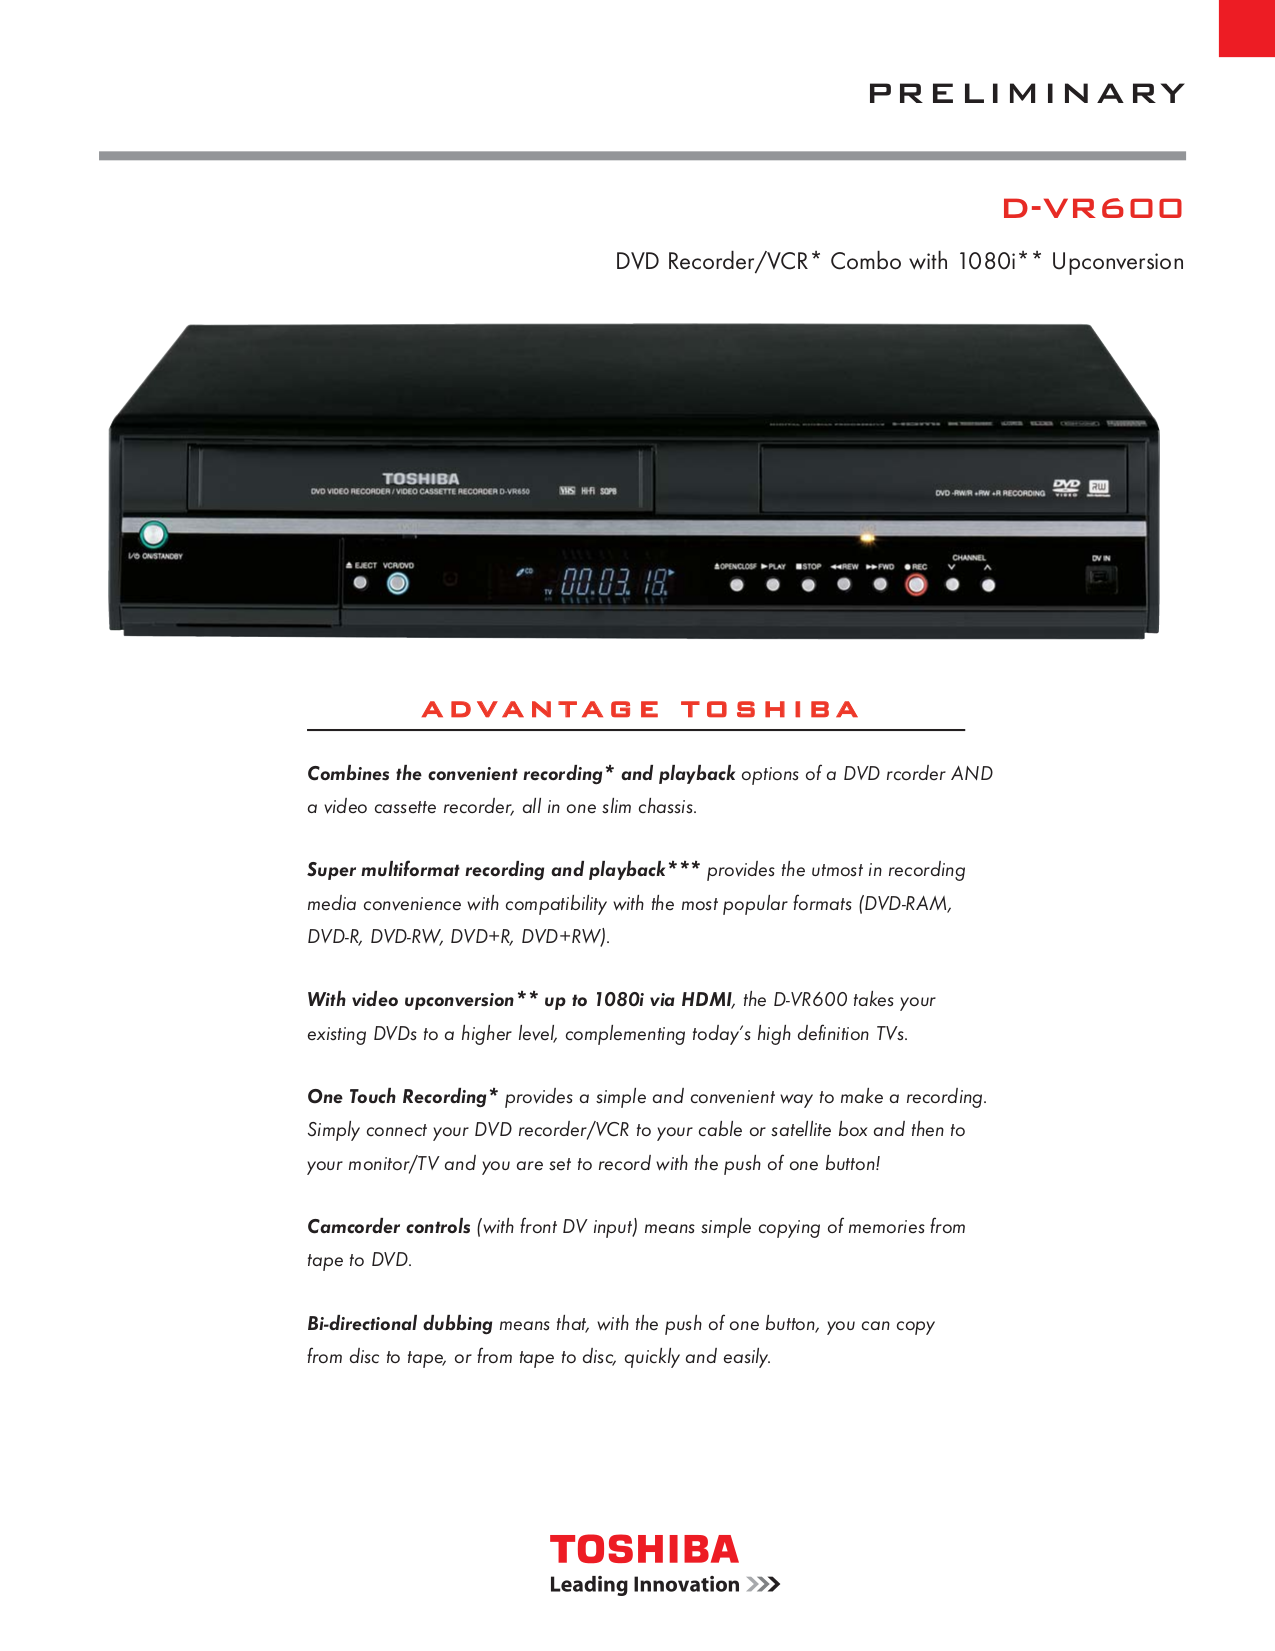 D Vr600 Manual Toshiba G7 Asd Wiring Diagram Array Download Free Pdf For Dvd Players Rh Umlib Com